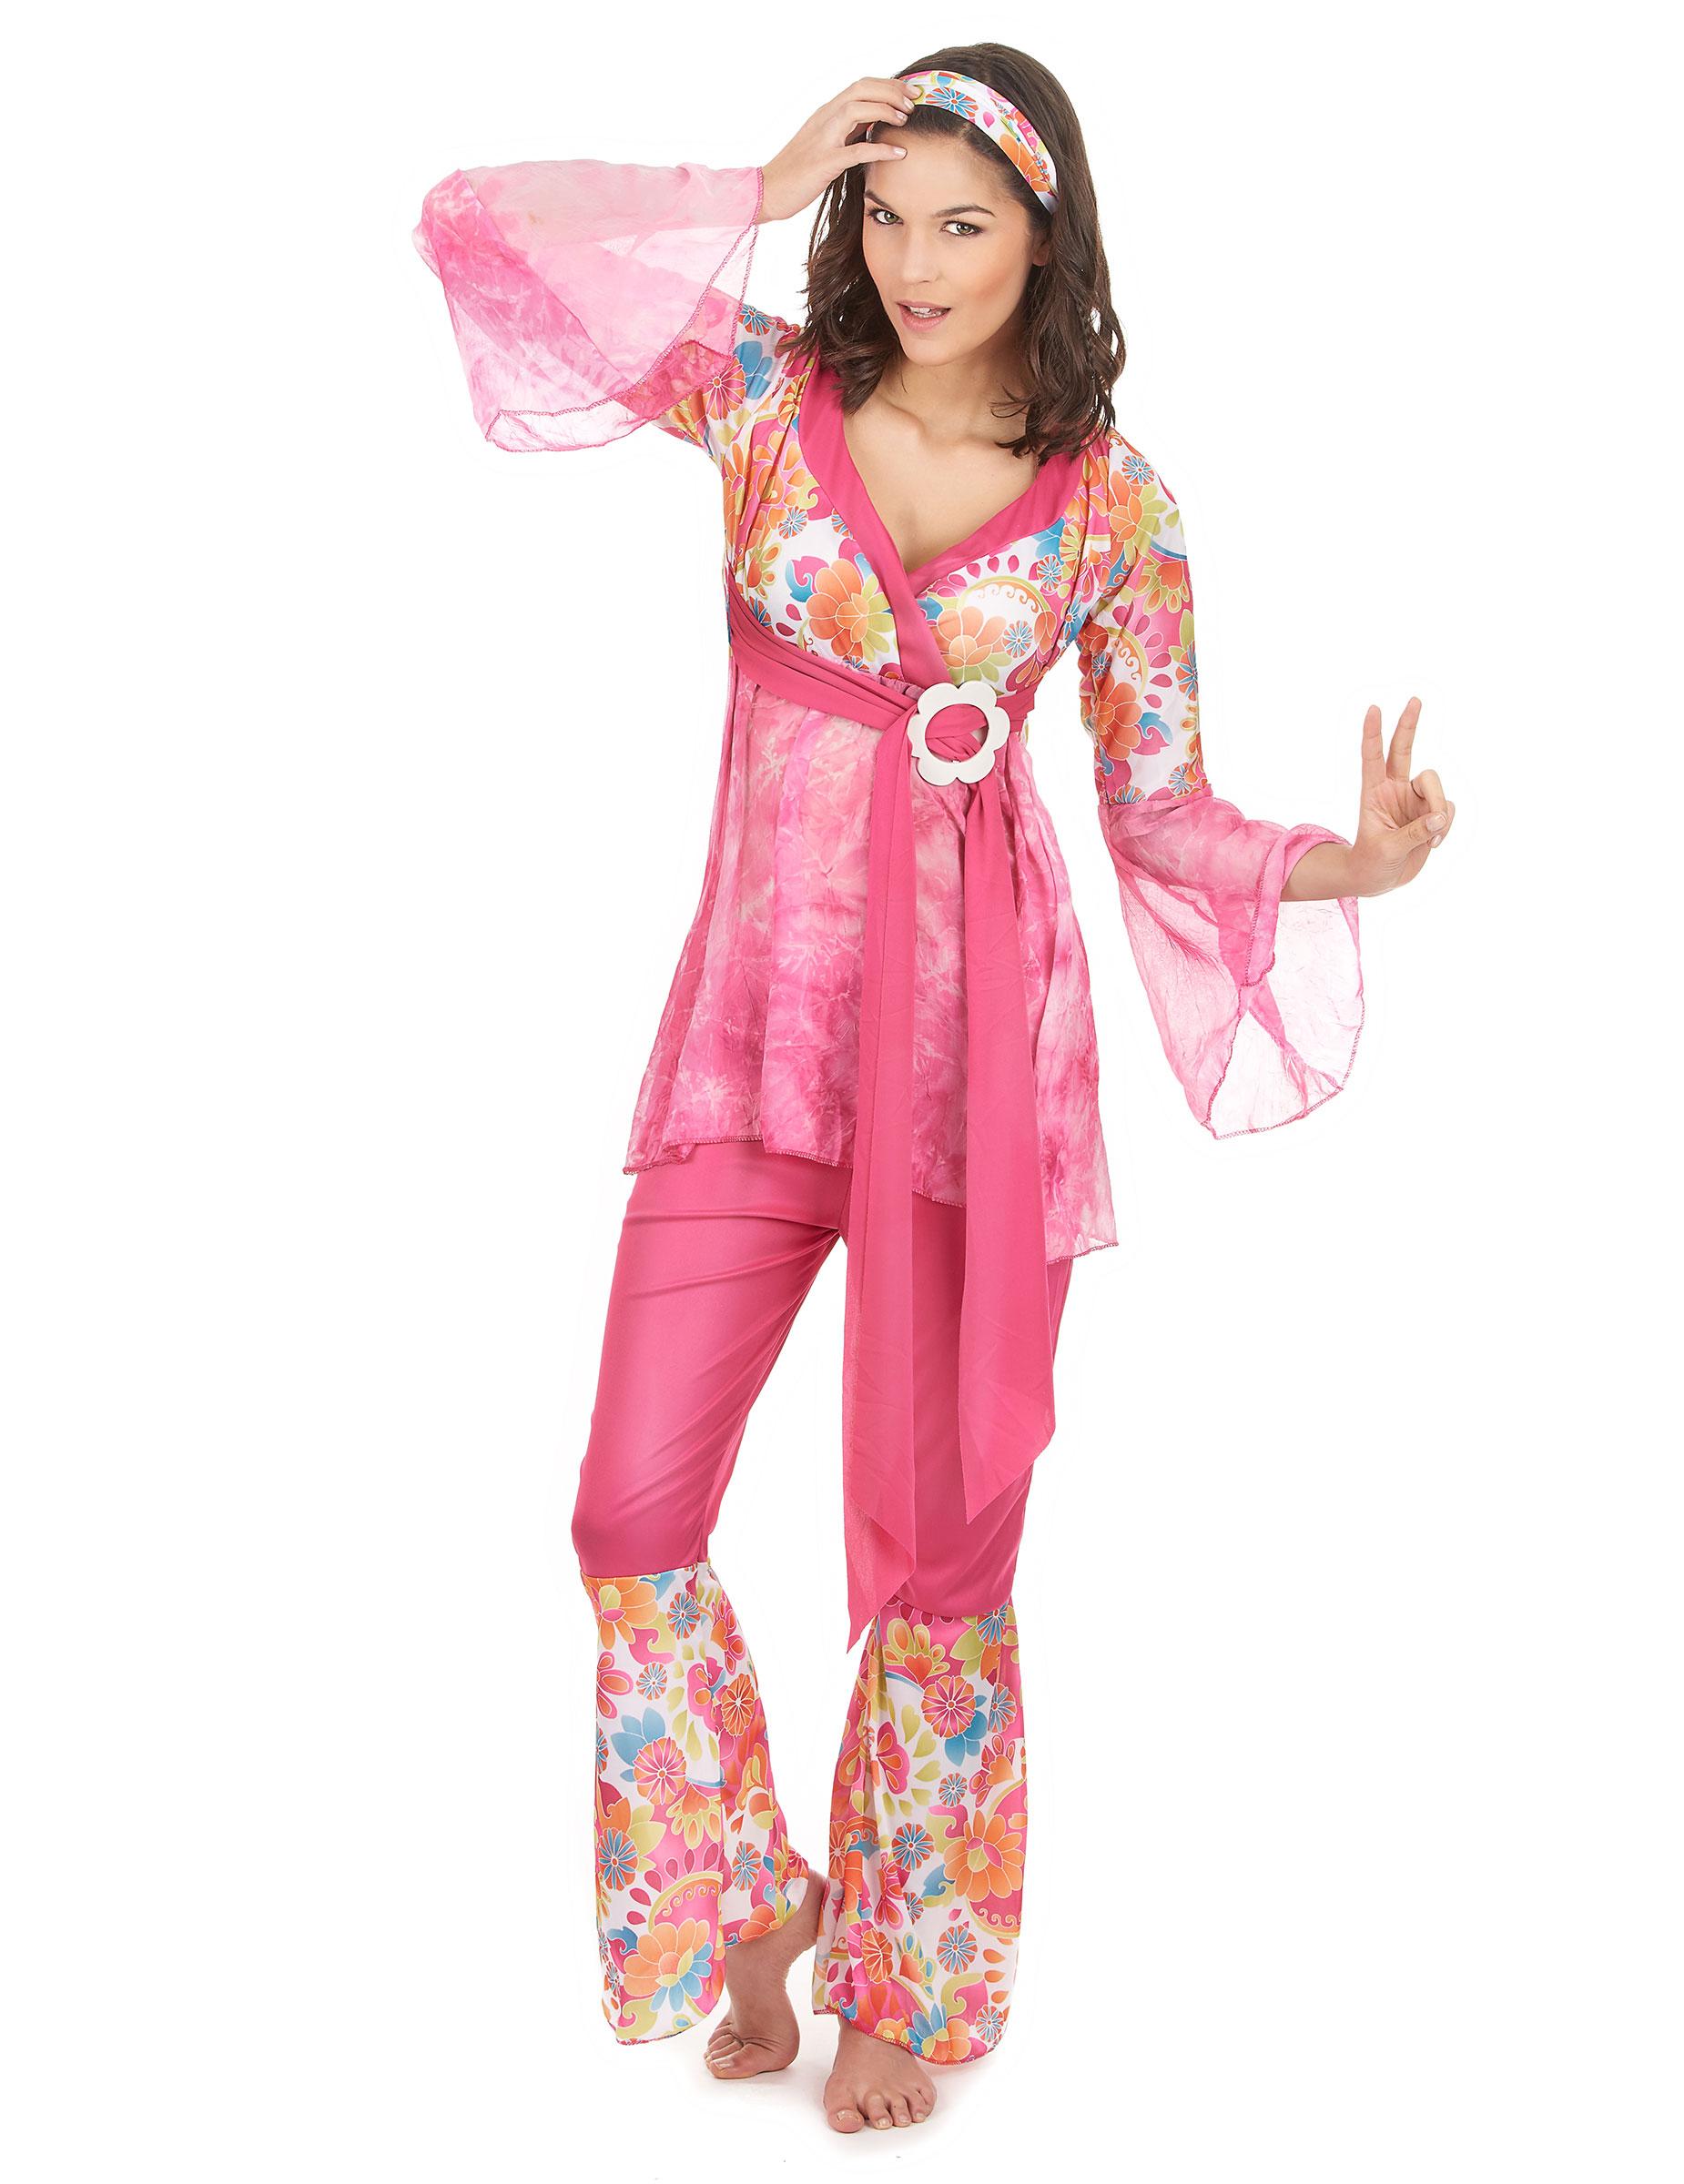 Hippie jurk lang carnaval | Populaire jurken Modellen 2018